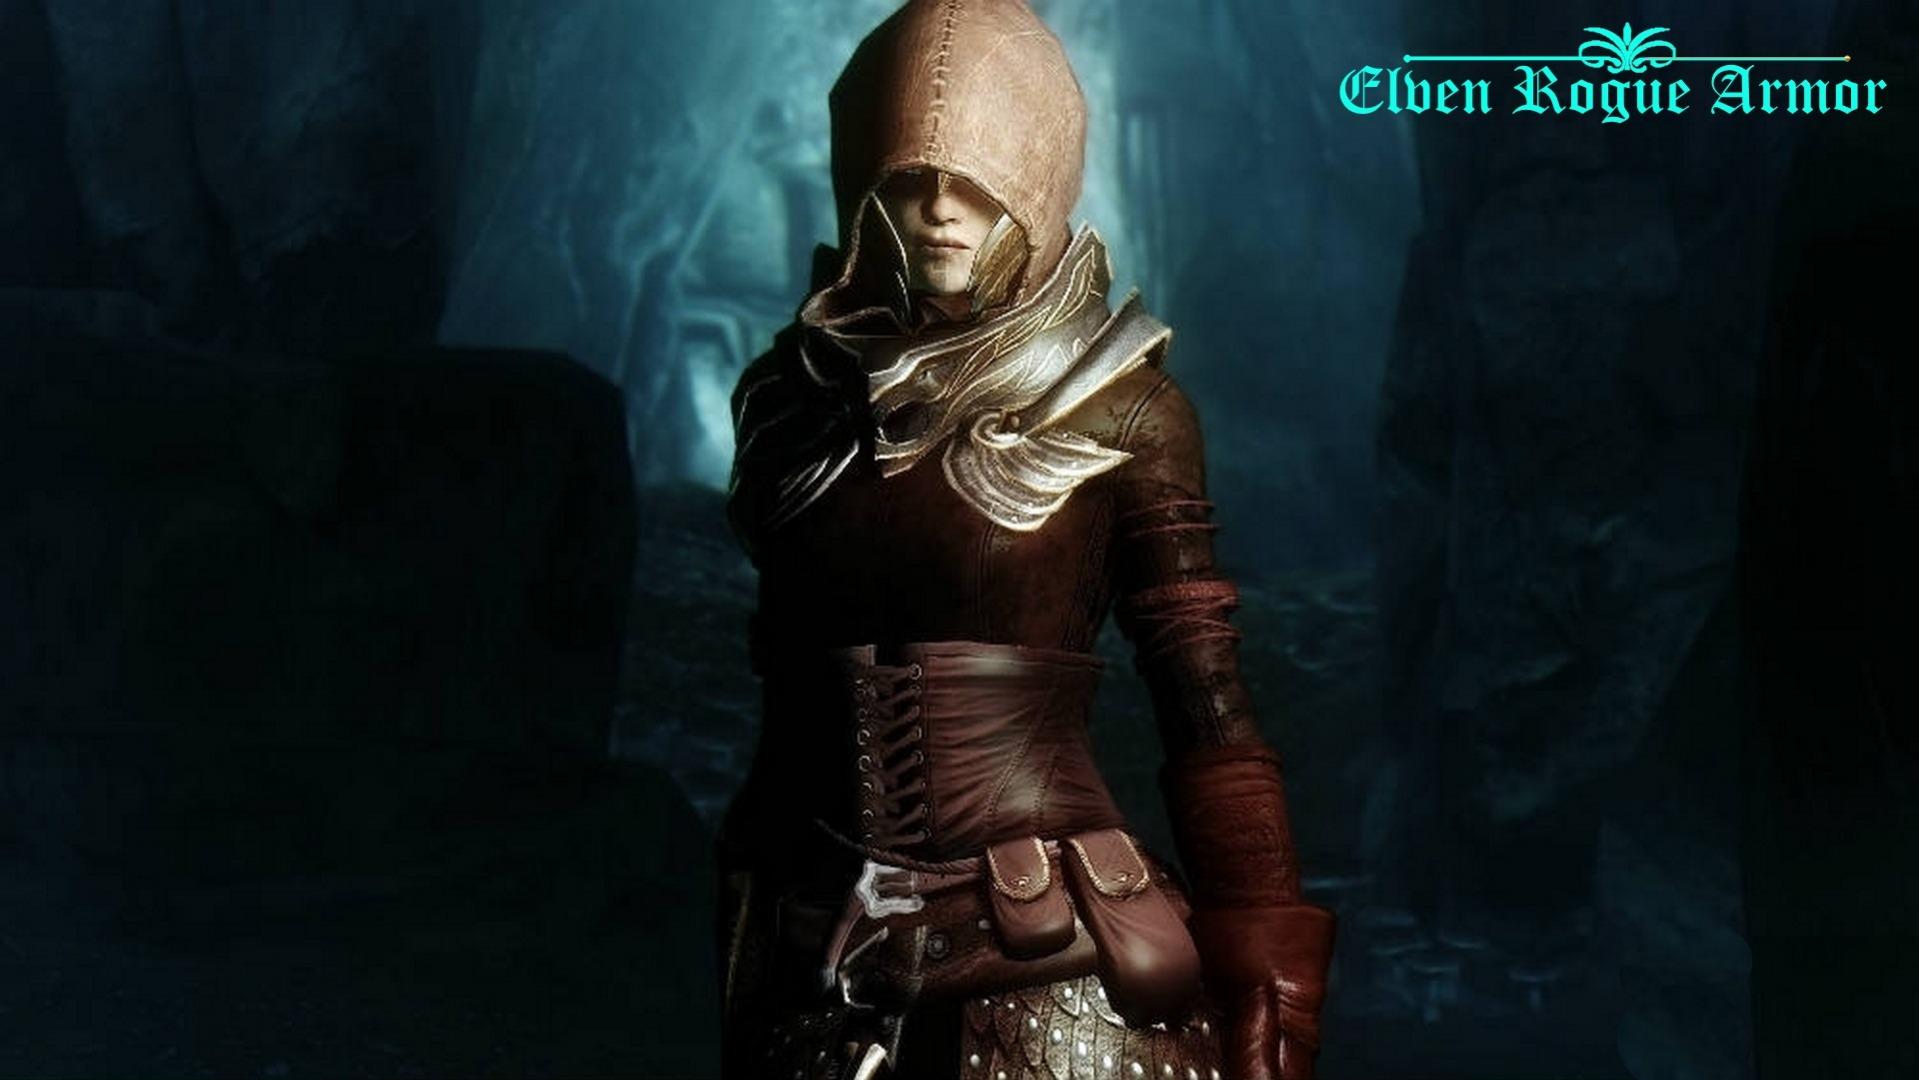 Elven_Rogue_Armor.jpg